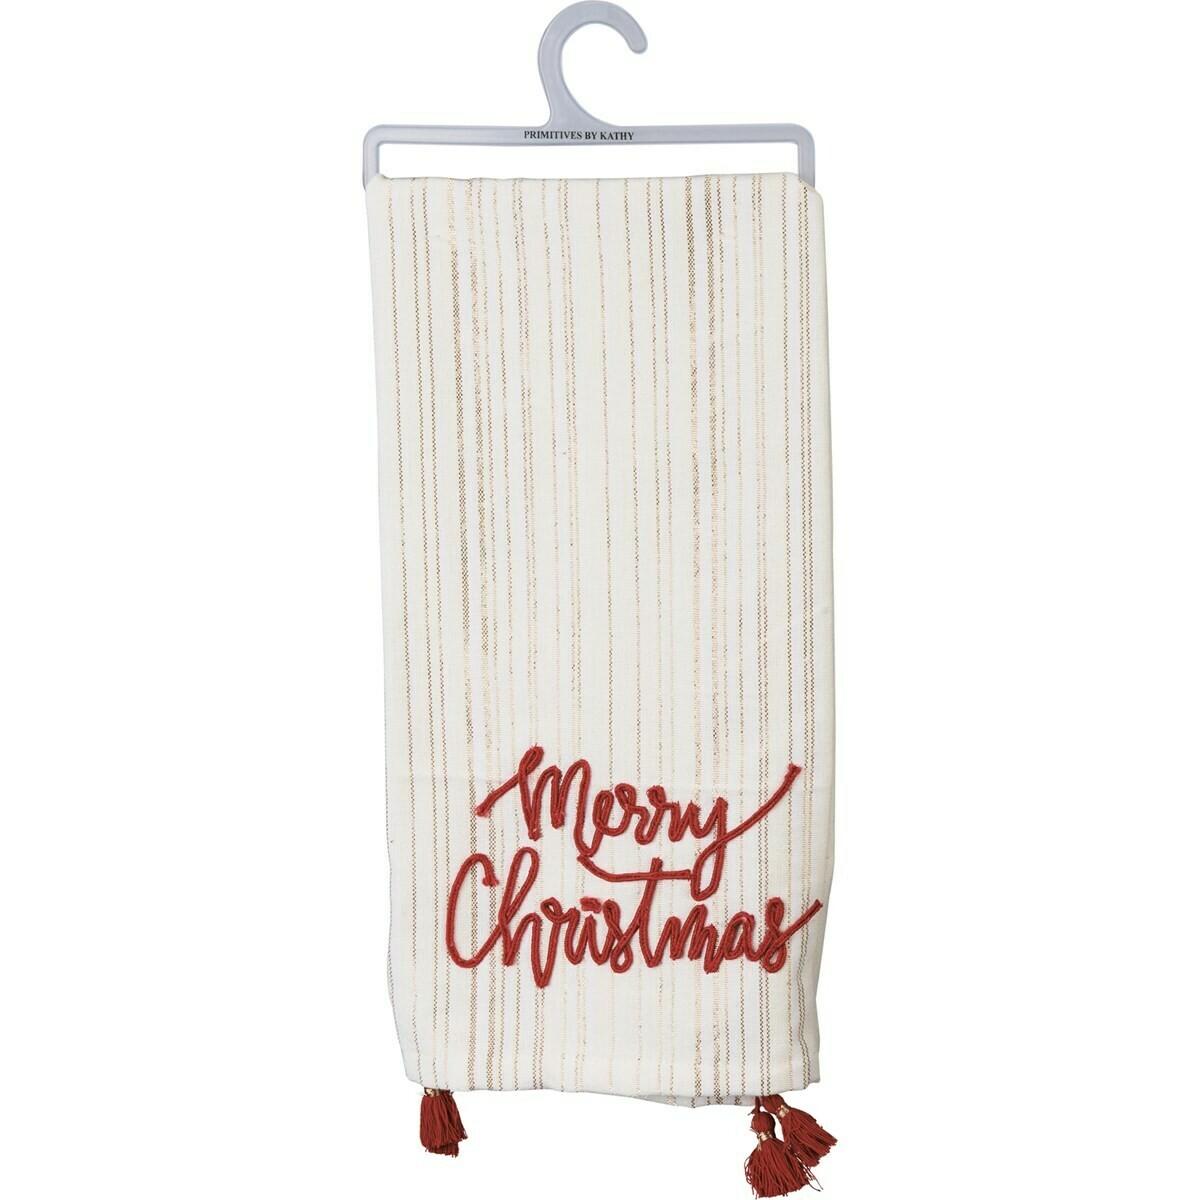 Merry Christmas Sparkle Tassel Towel